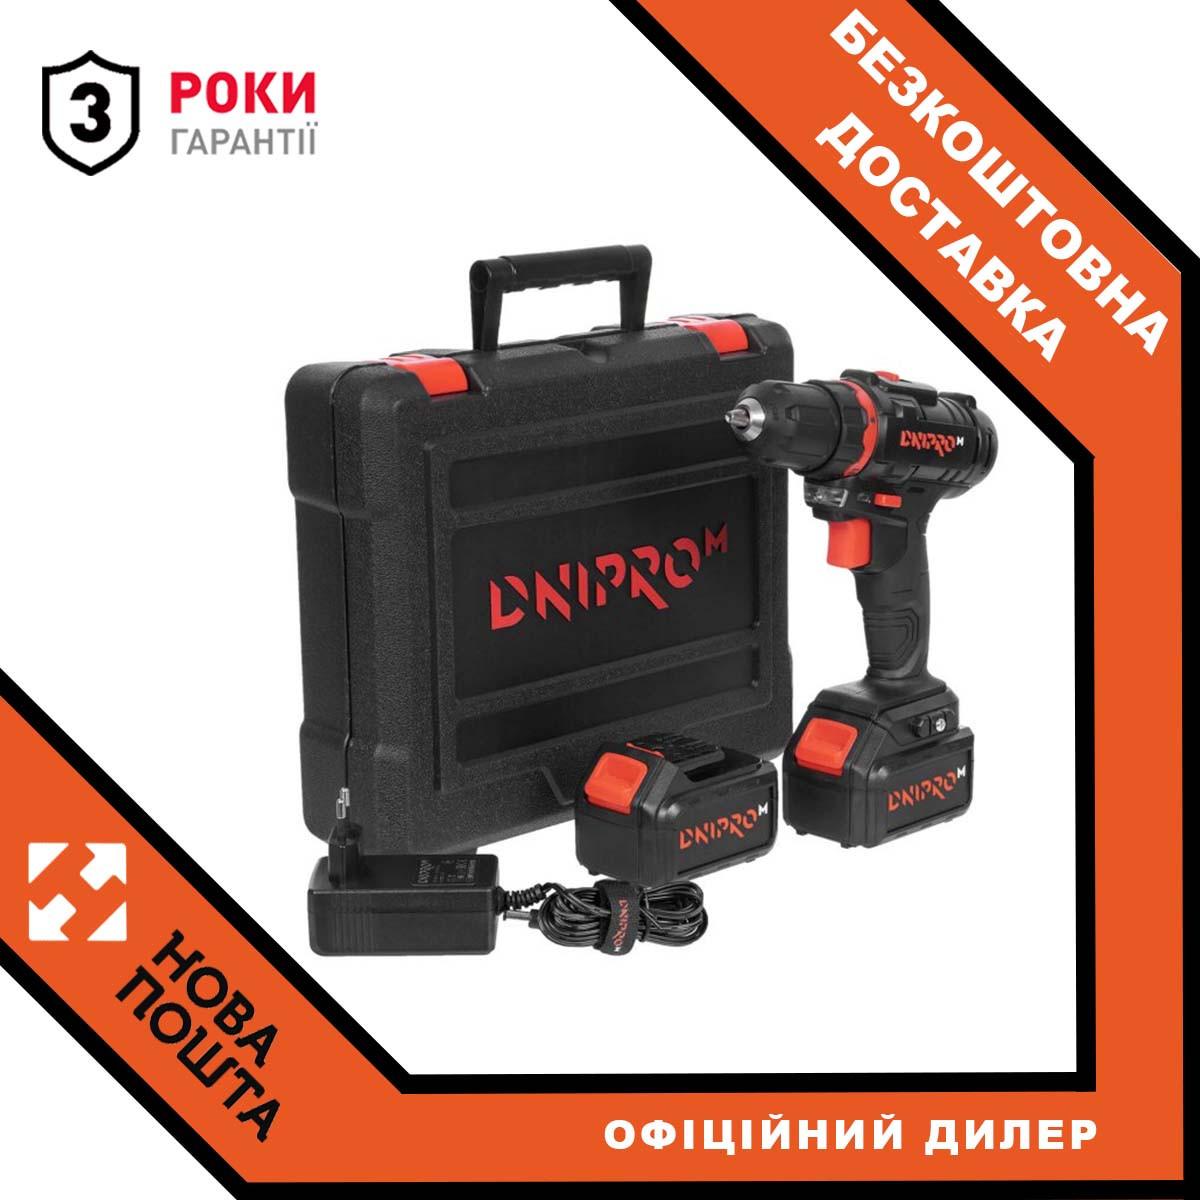 Акумуляторний дриль-шуруповерт Dnipro-M CD-182